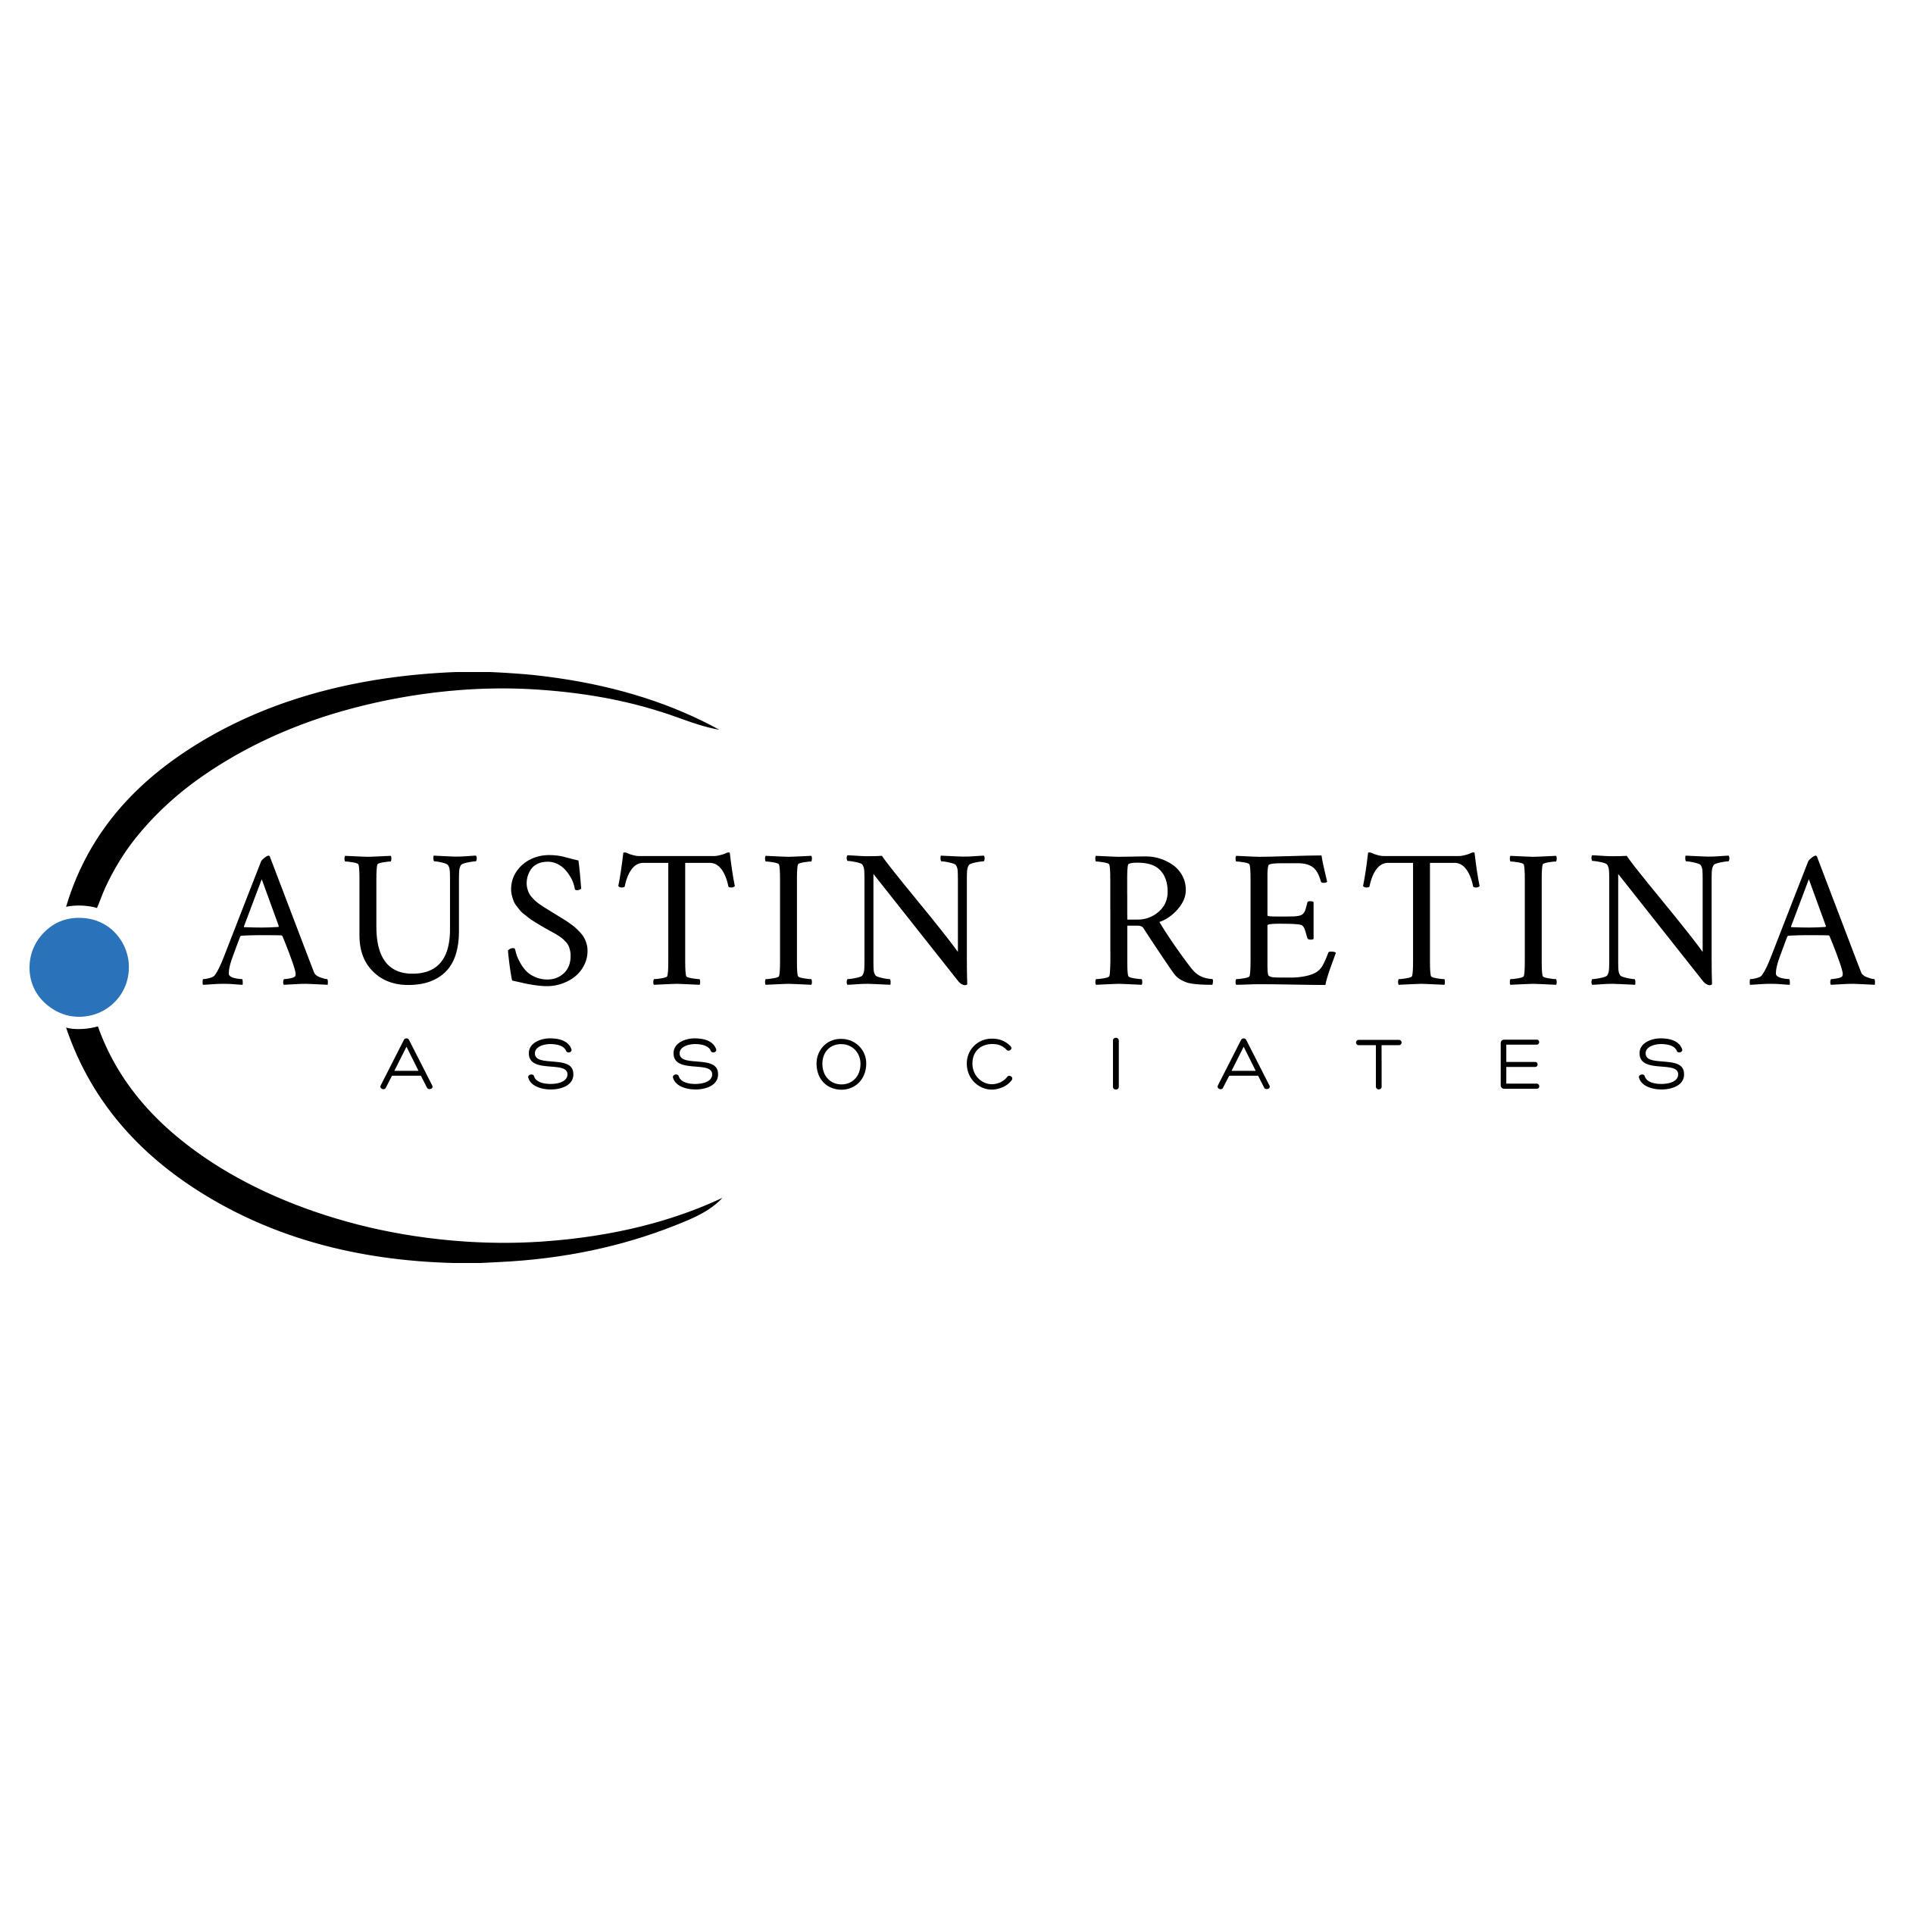 Austin Retina Associates - South